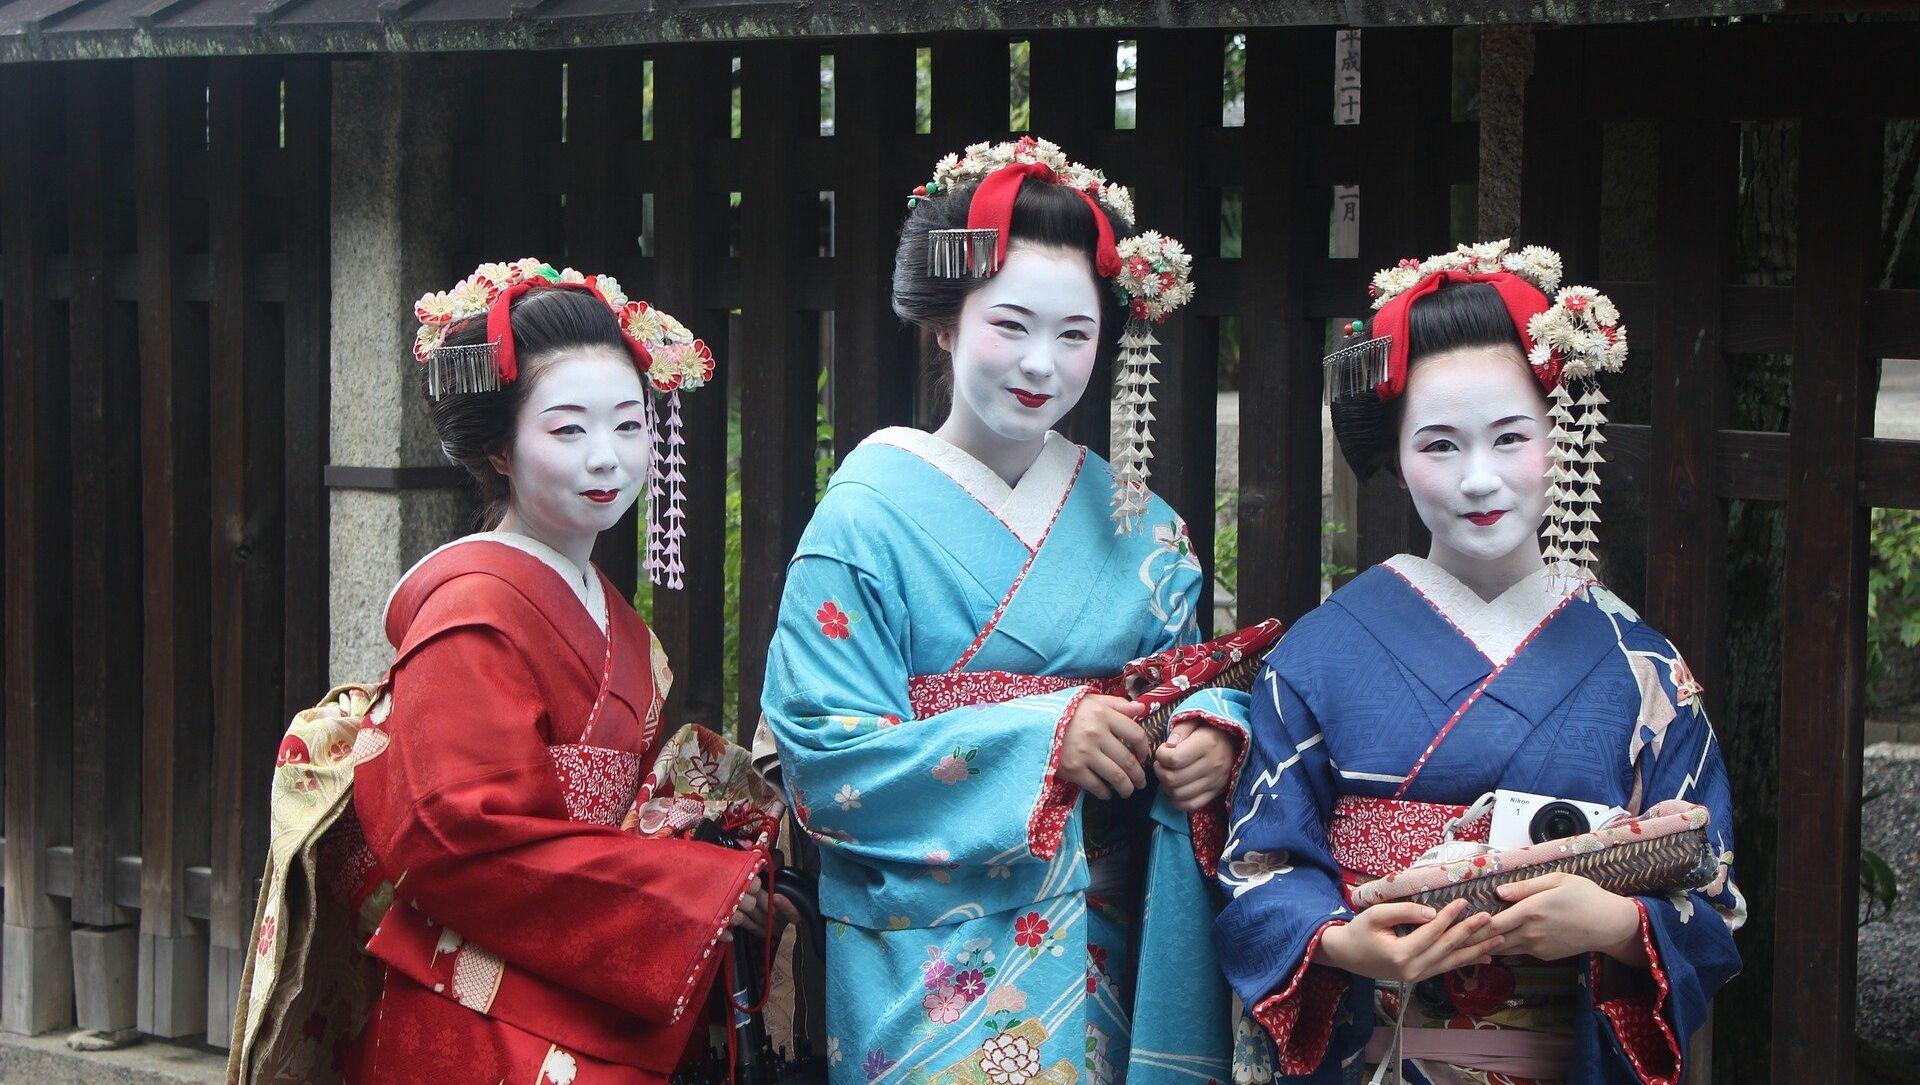 Geishas japonesas - Sputnik Mundo, 1920, 19.07.2017